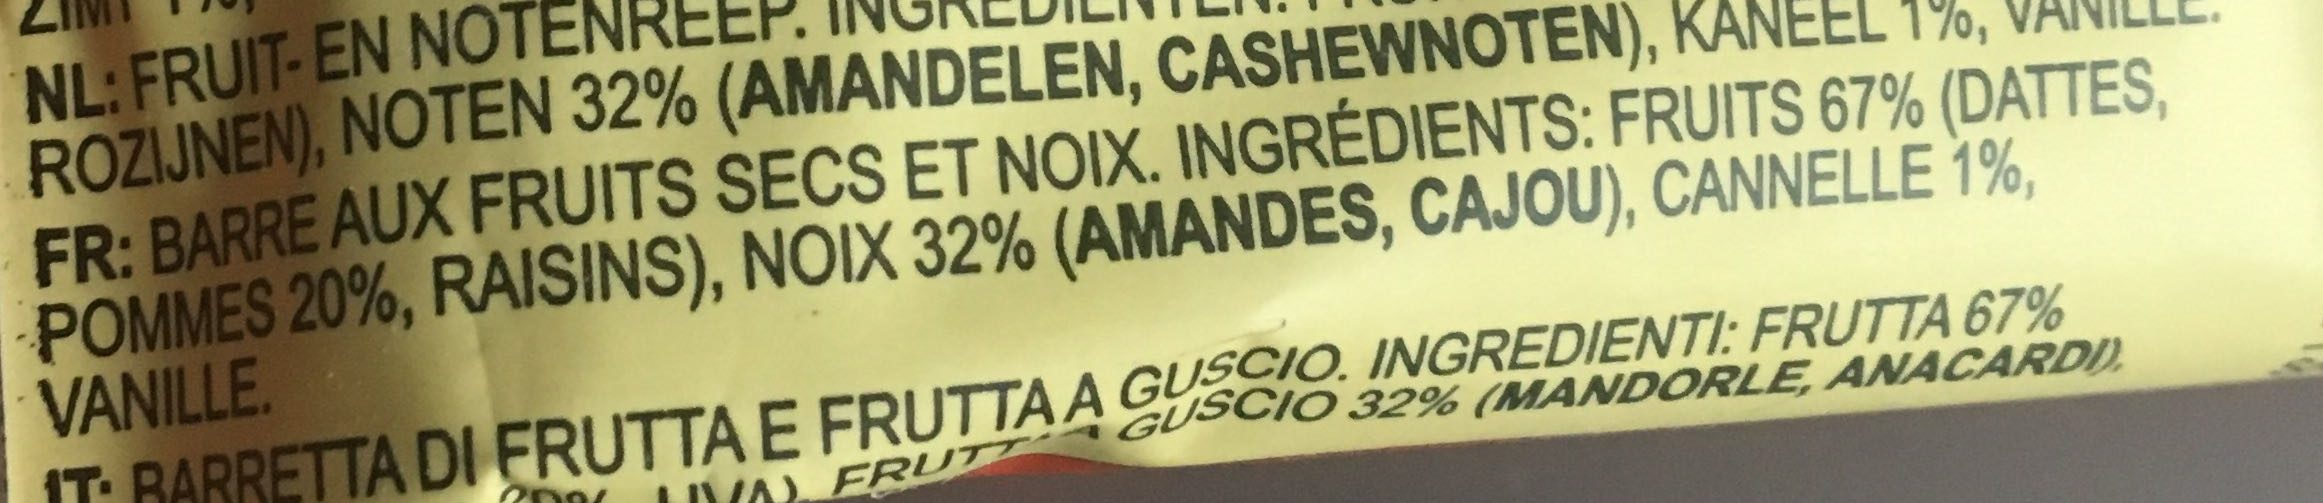 Apple Cinnamon - Ingrédients - fr